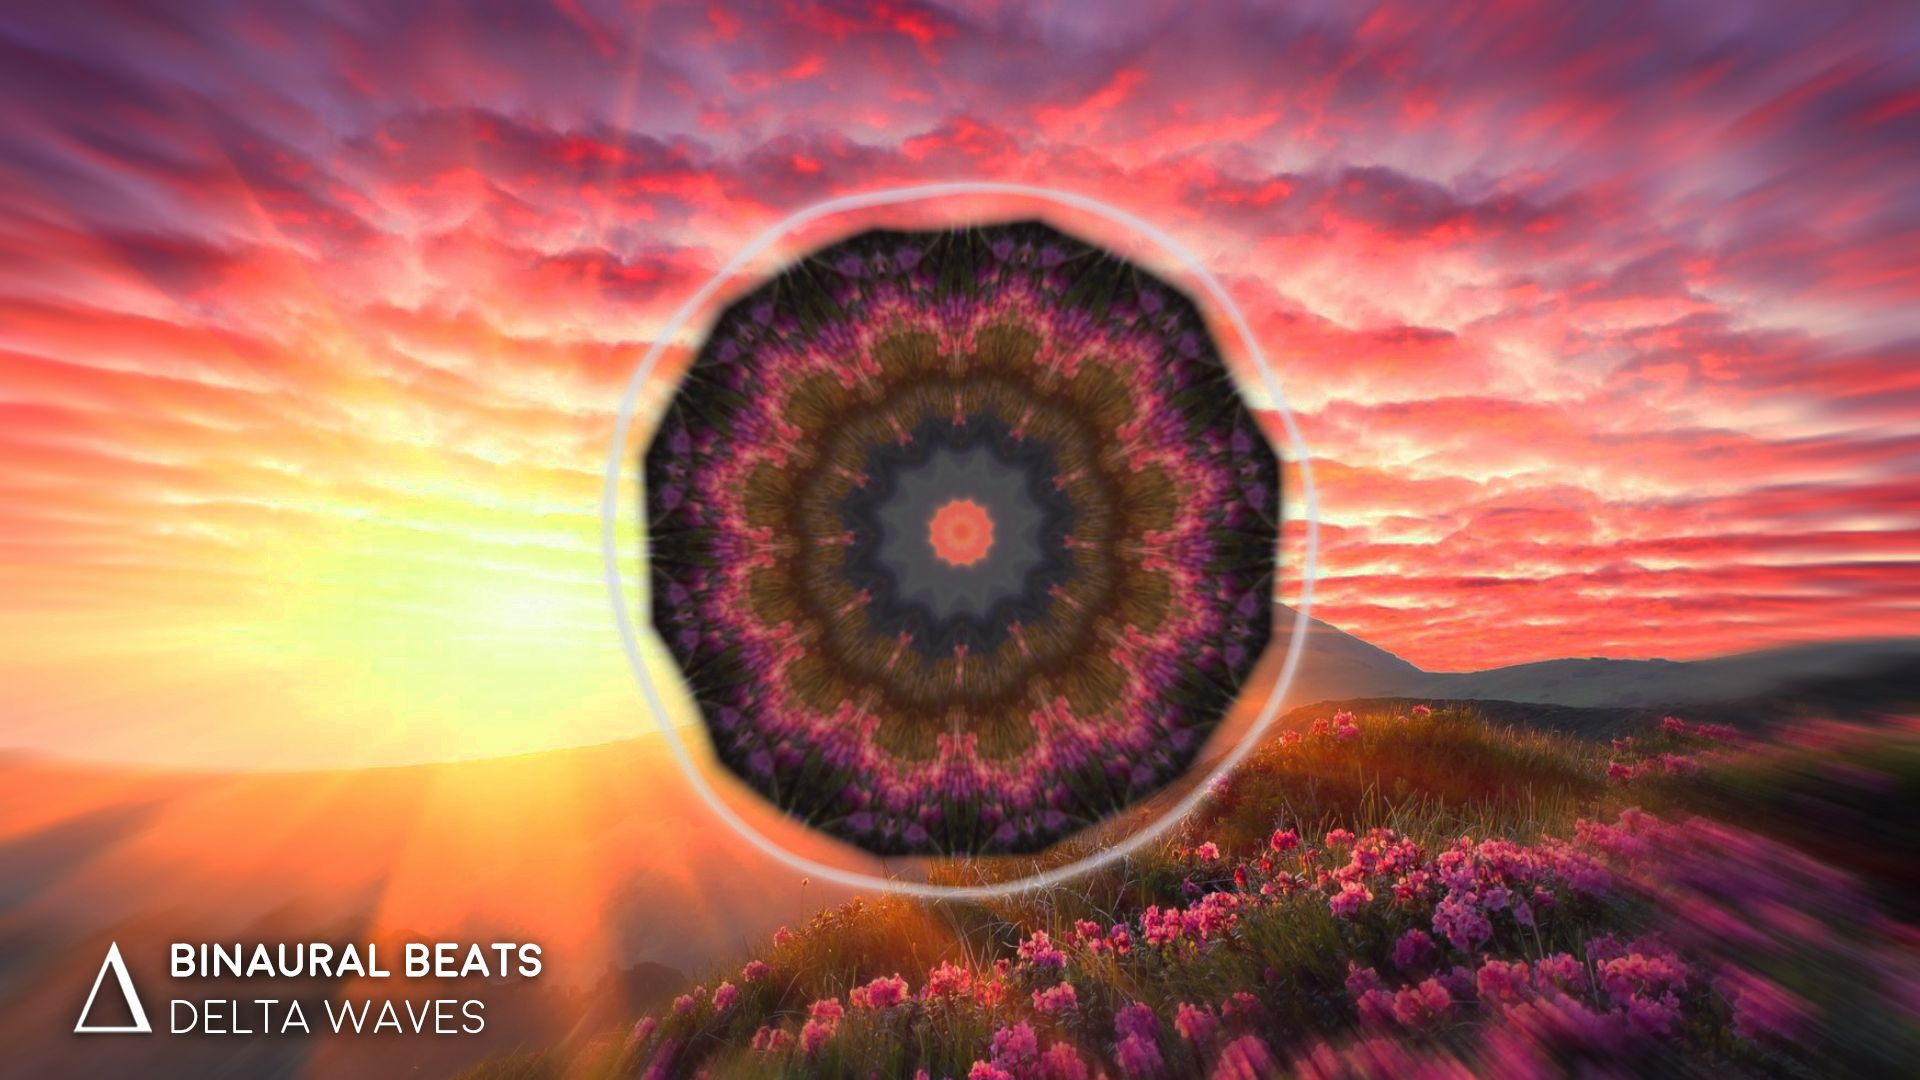 Intensely Relaxing Sleep Hypnosis Binaural Beats [ASMR Triggers